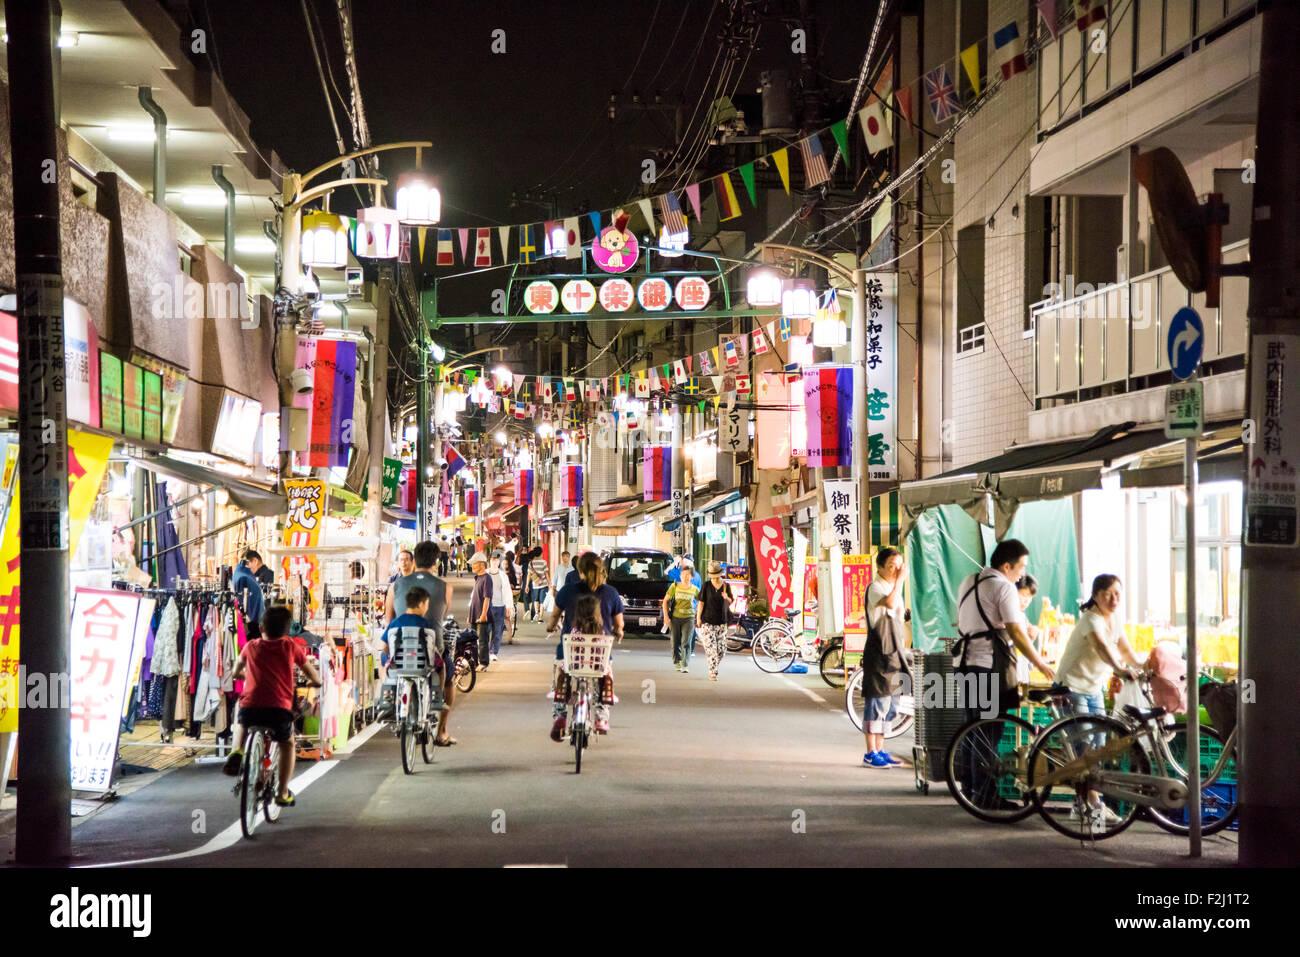 Higashijujo Shopping street,Kita-Ku,Tokyo,Japan - Stock Image